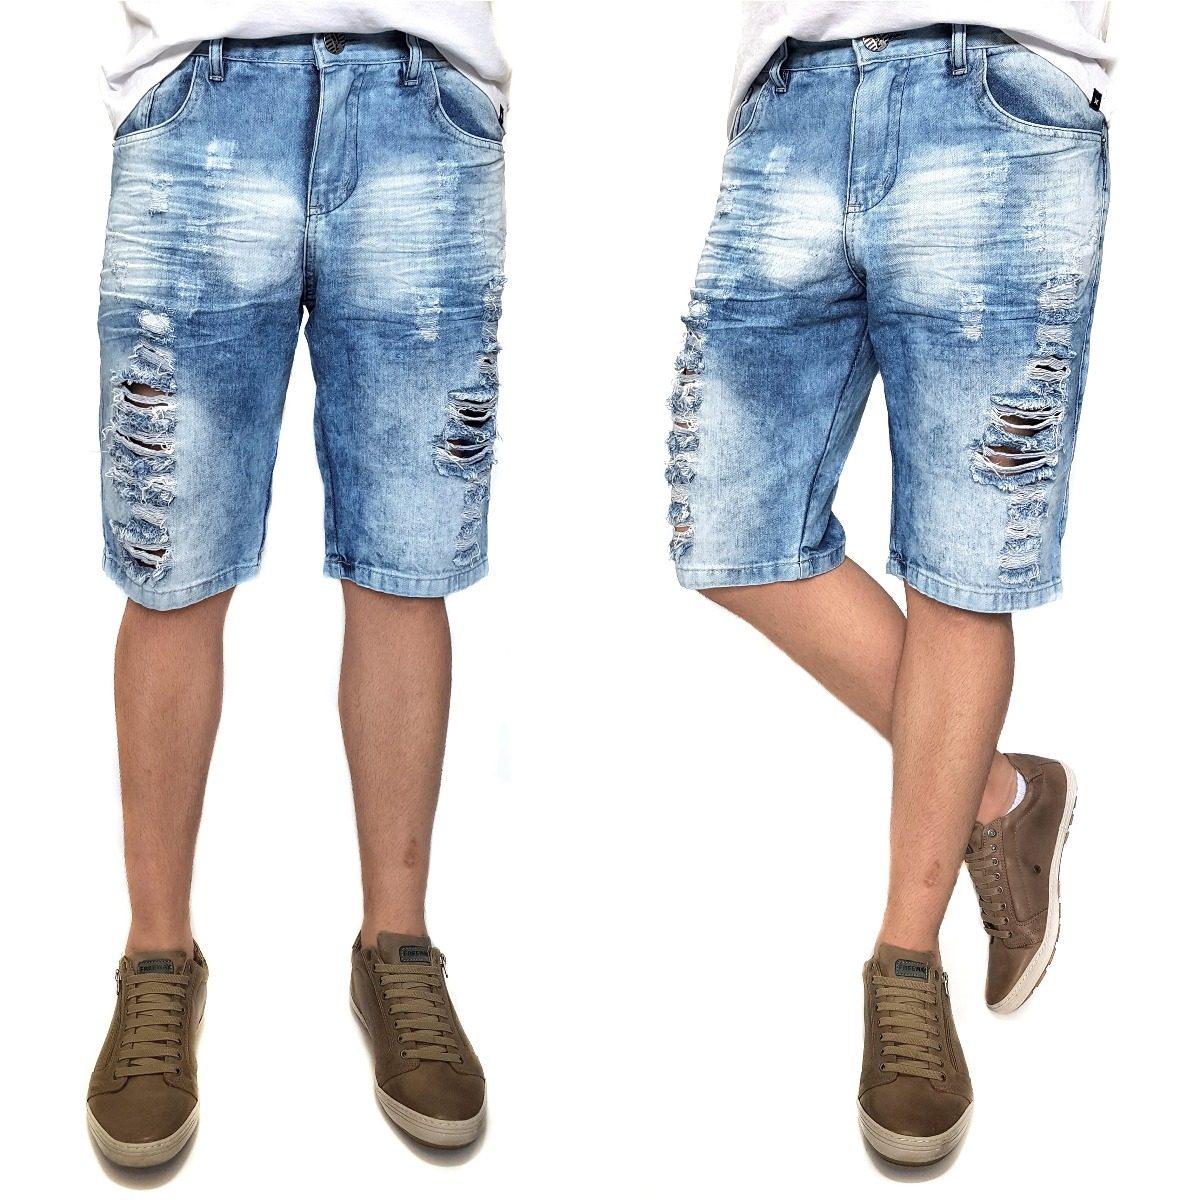 Bermuda Masculina Jeans Sarja Varias Cores Premium - R  49 0babdd764ae